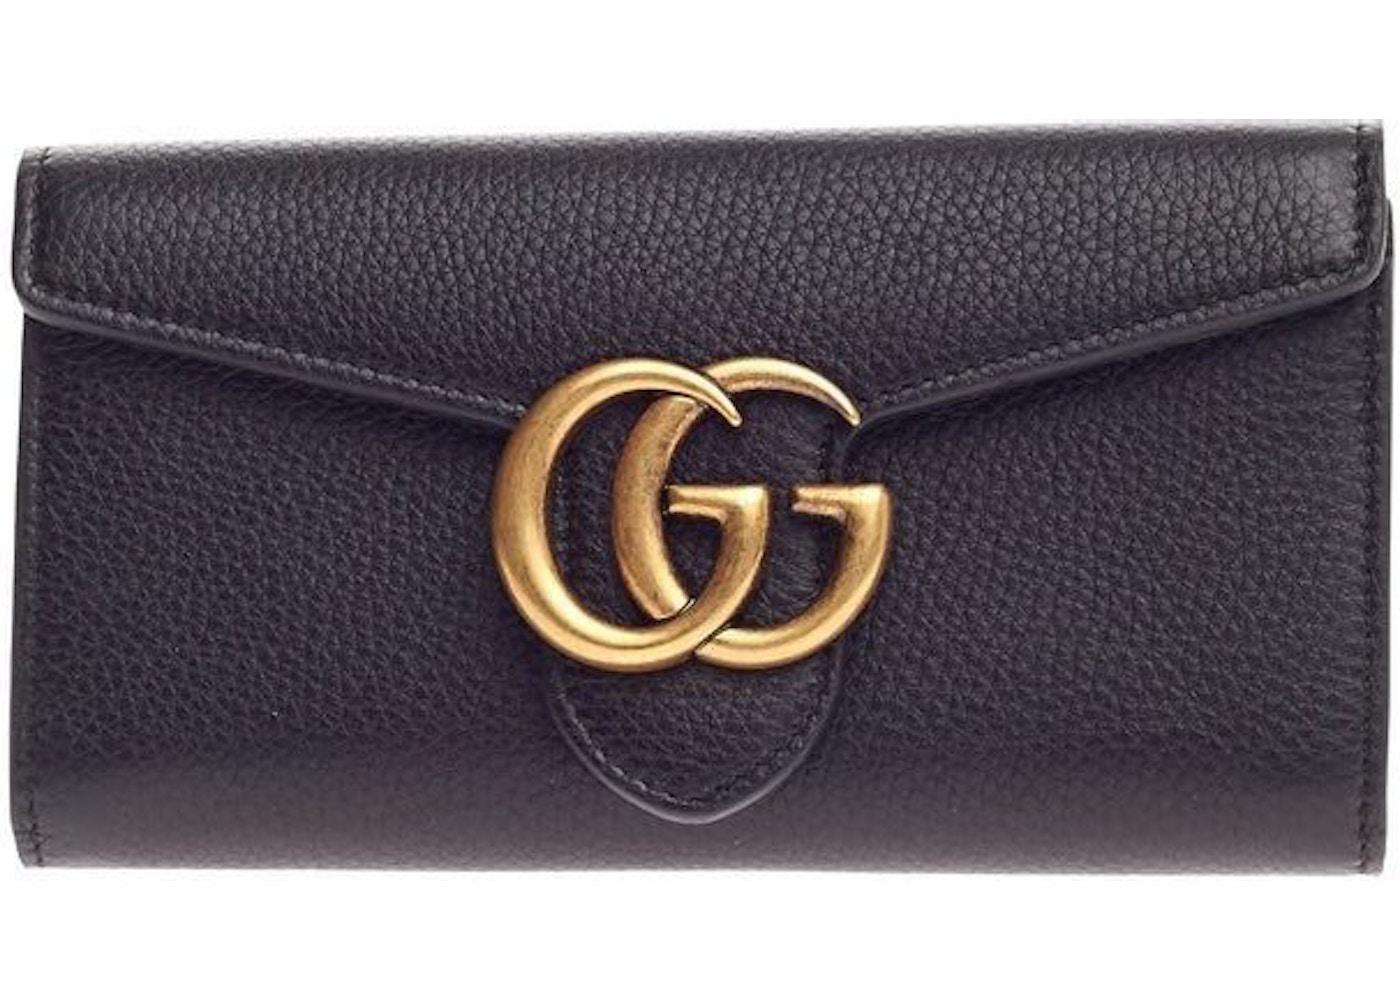 a45f50794ef340 Gucci Marmont Wallet Black. Black